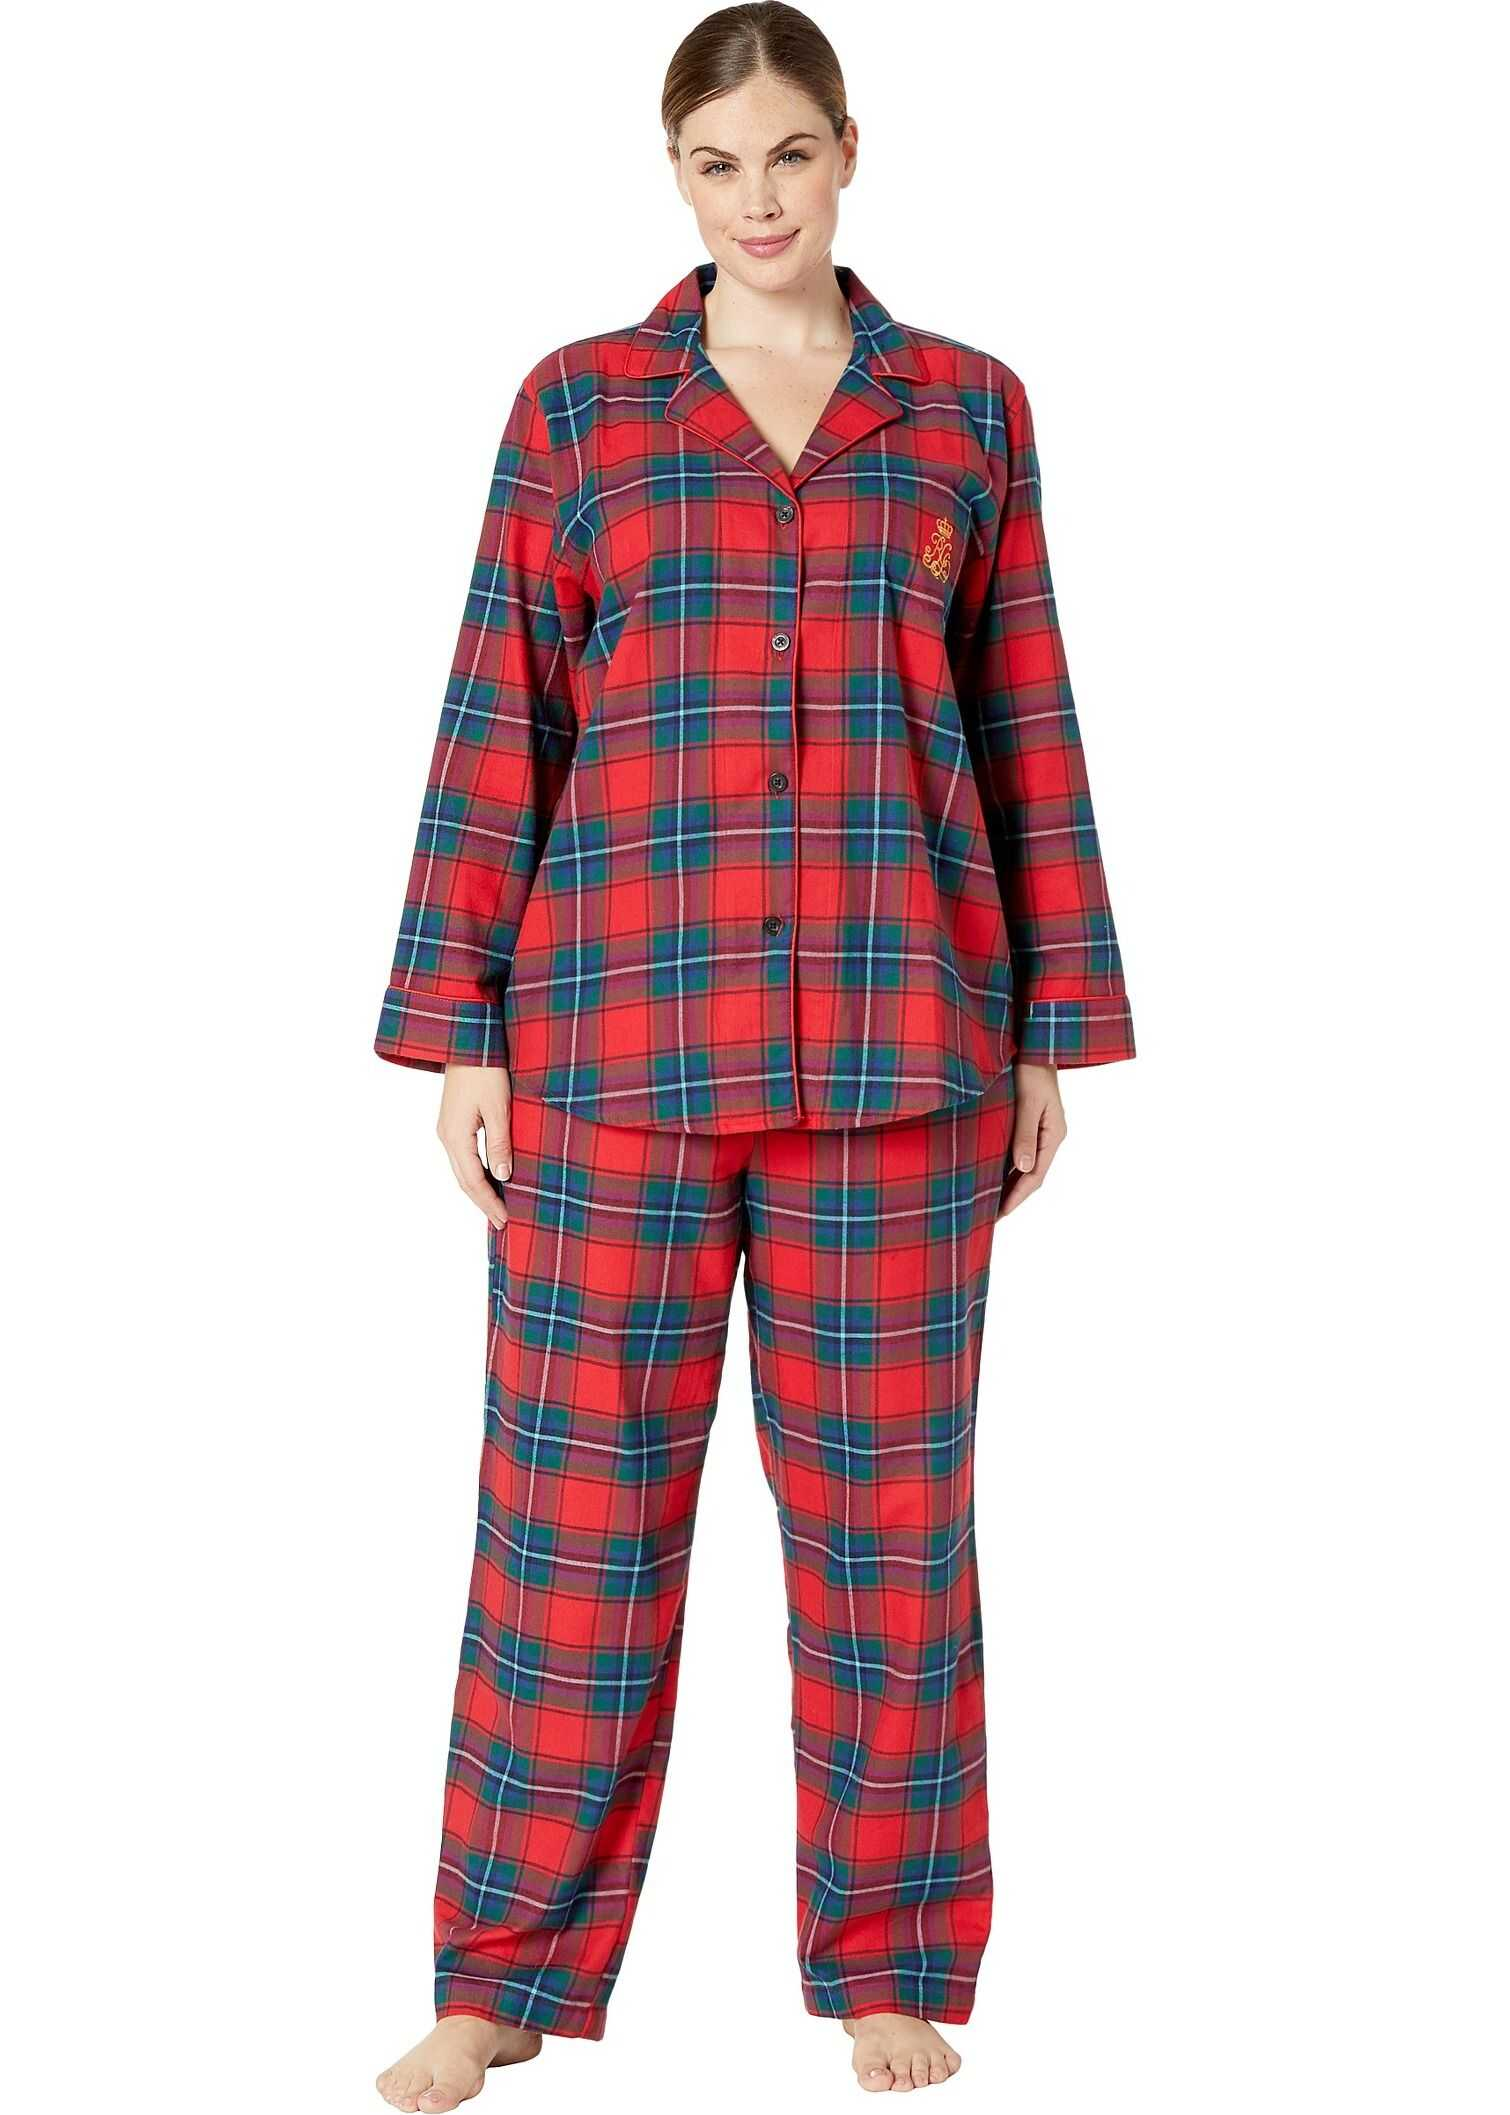 Ralph Lauren Plus Size Brushed Twill Long Sleeve Notch Collar Long Pants Pajama Set Red Plaid